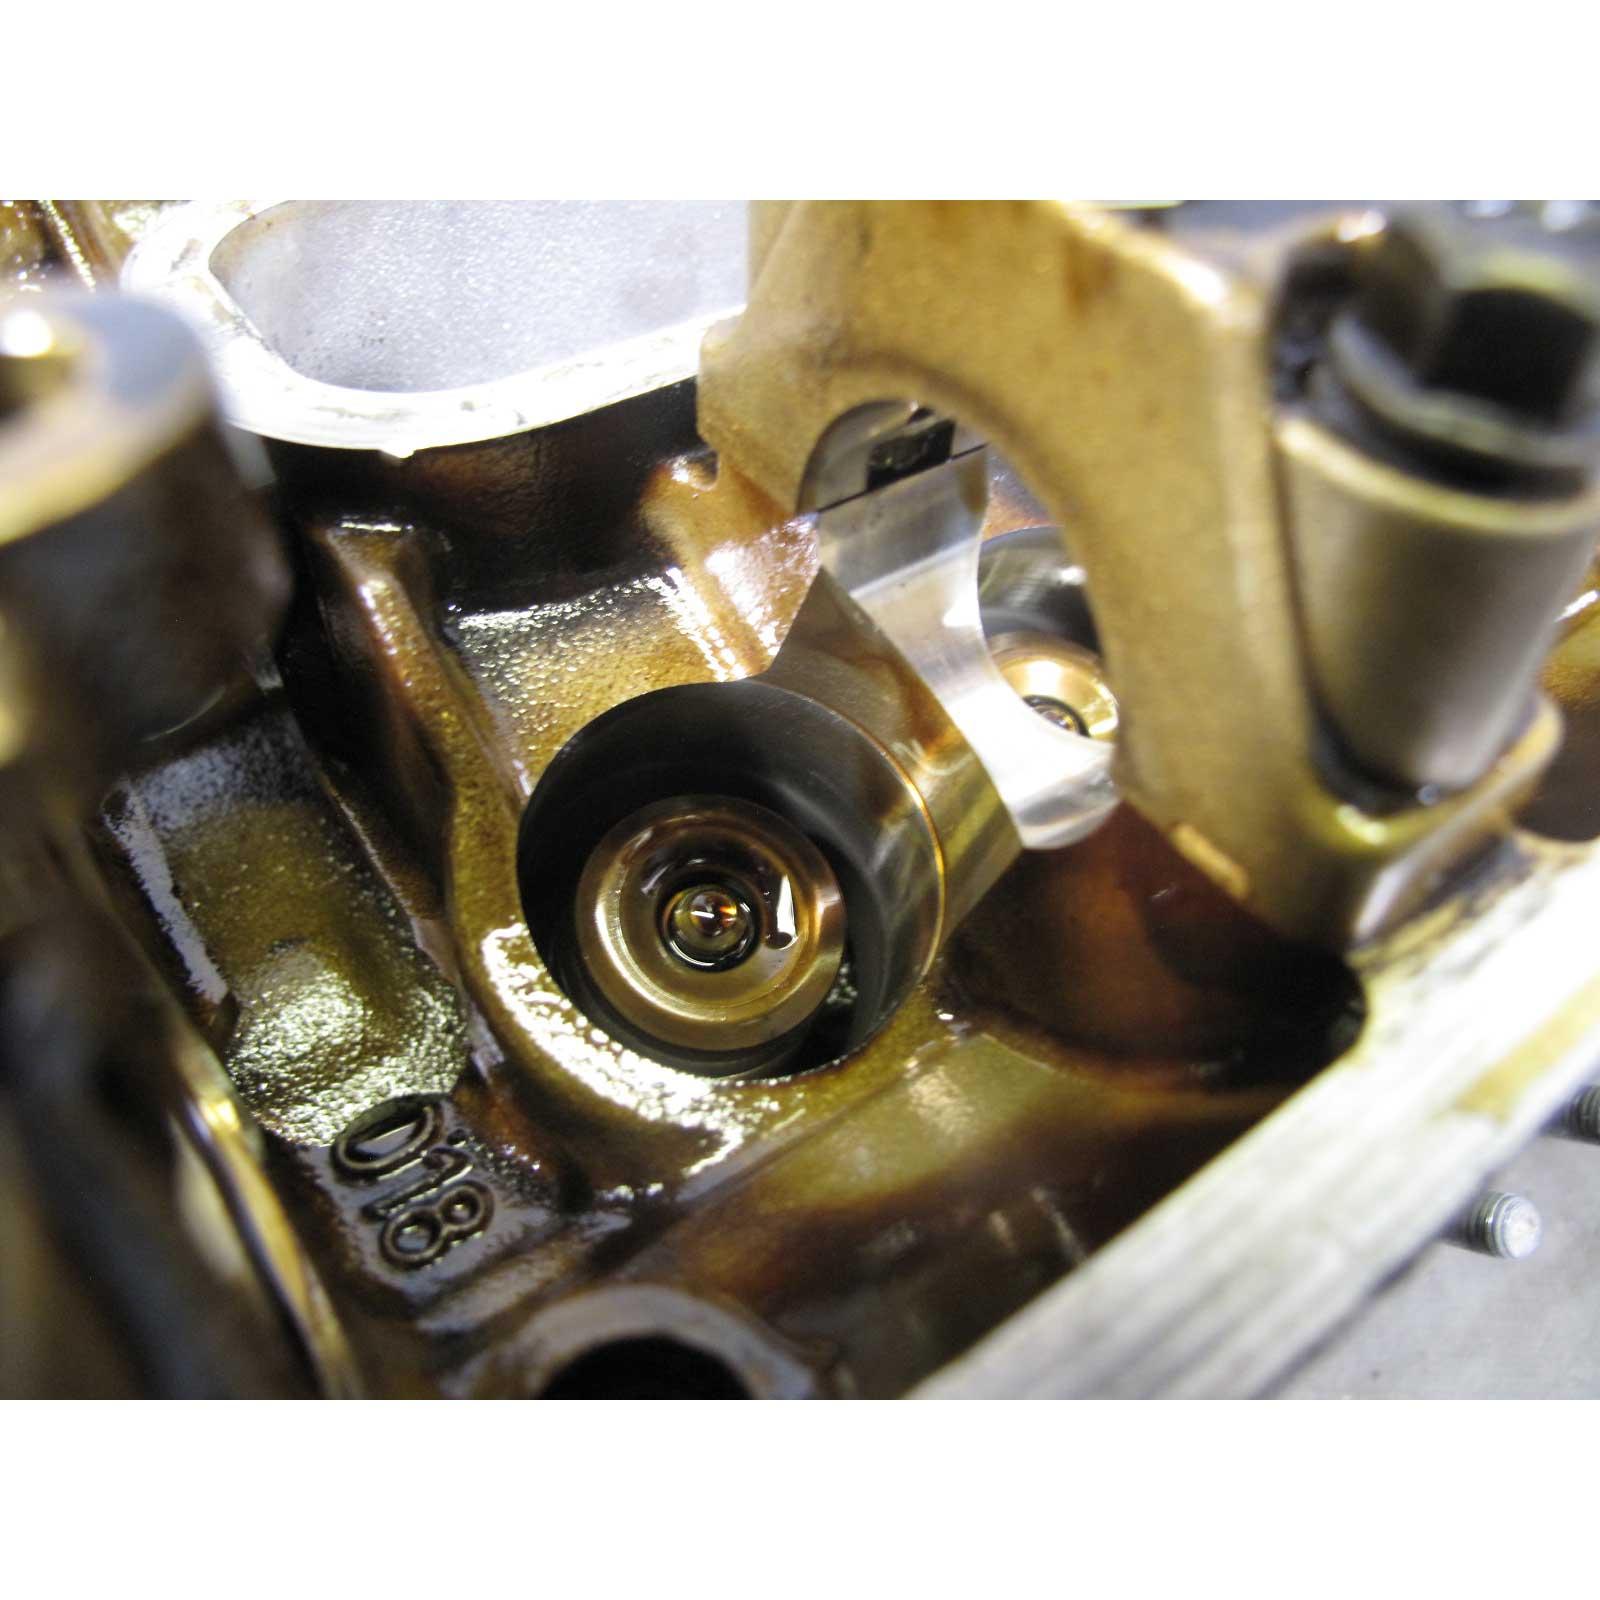 BMW S62 5.0L M5 Z8 Engine Right Bank 1 Cylinder Head Cyls